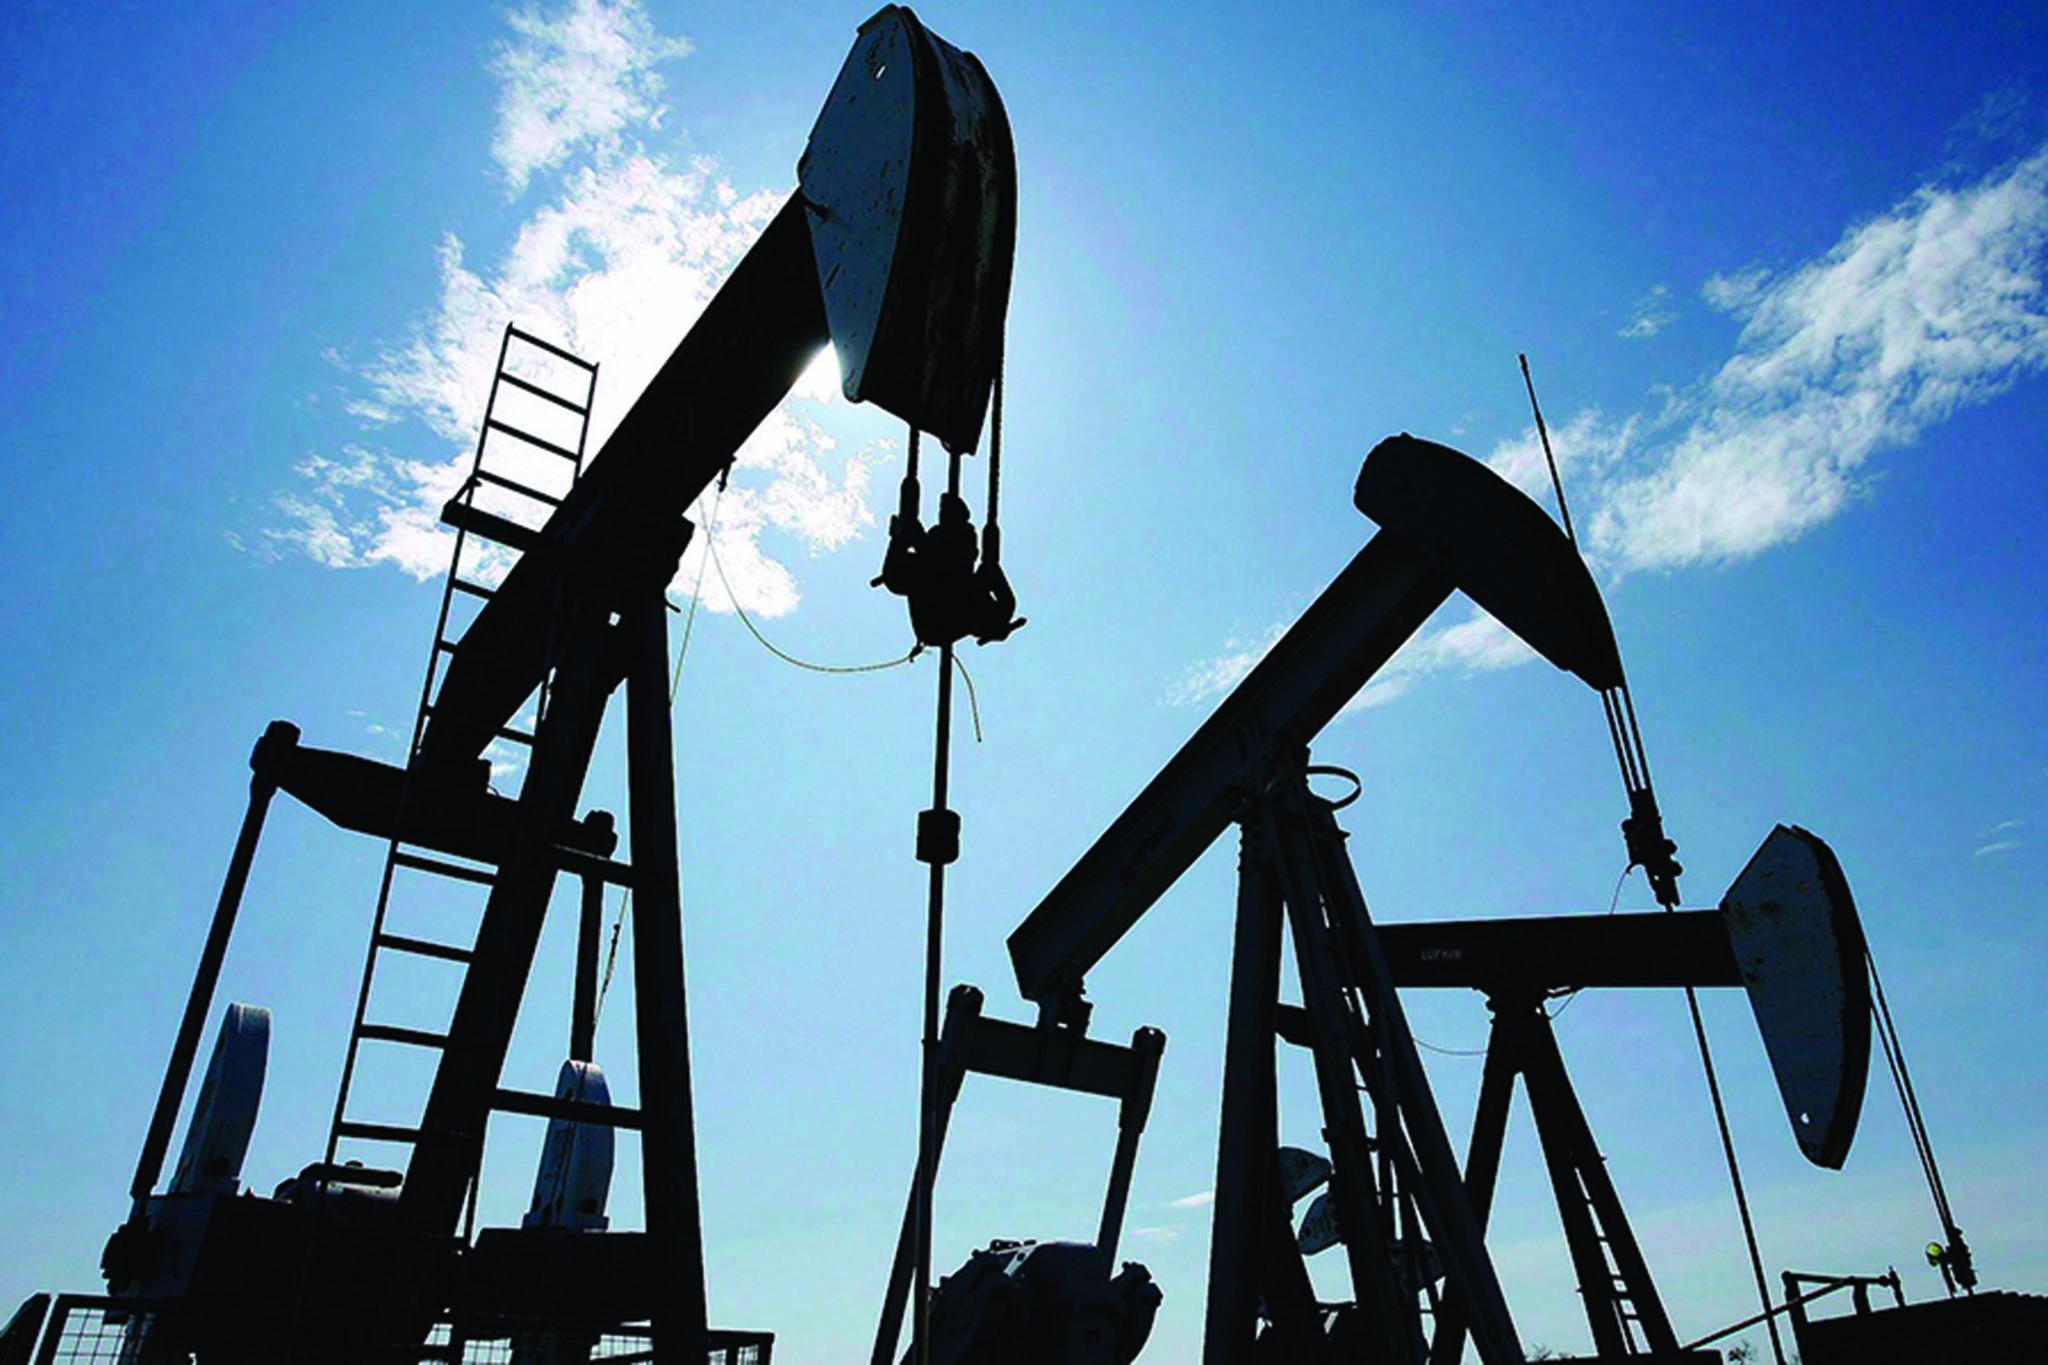 Pumpjacks pump crude oil near Halkirk, Alta., June 20, 2007. THE CANADIAN PRESS/Larry MacDougal